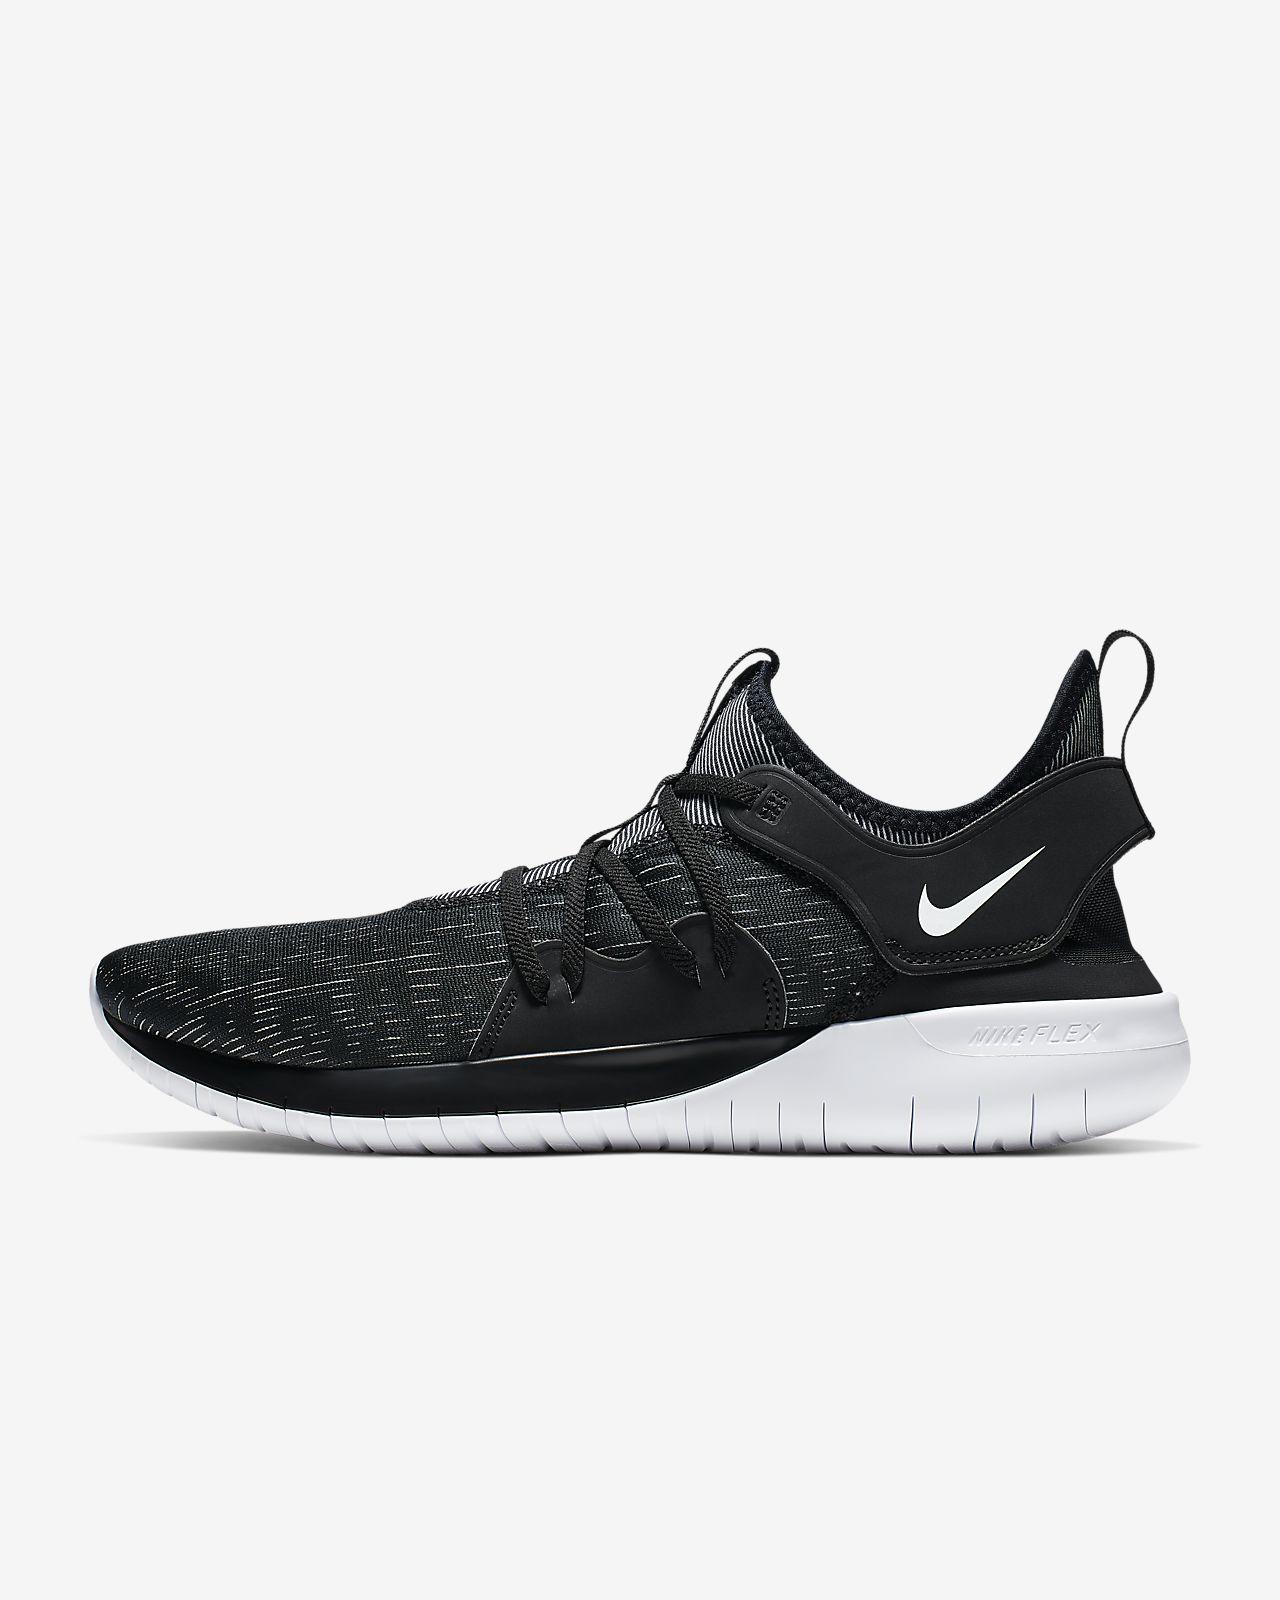 Leer política Oso  buy > nike flex men's running shoes black, Up to 68% OFF